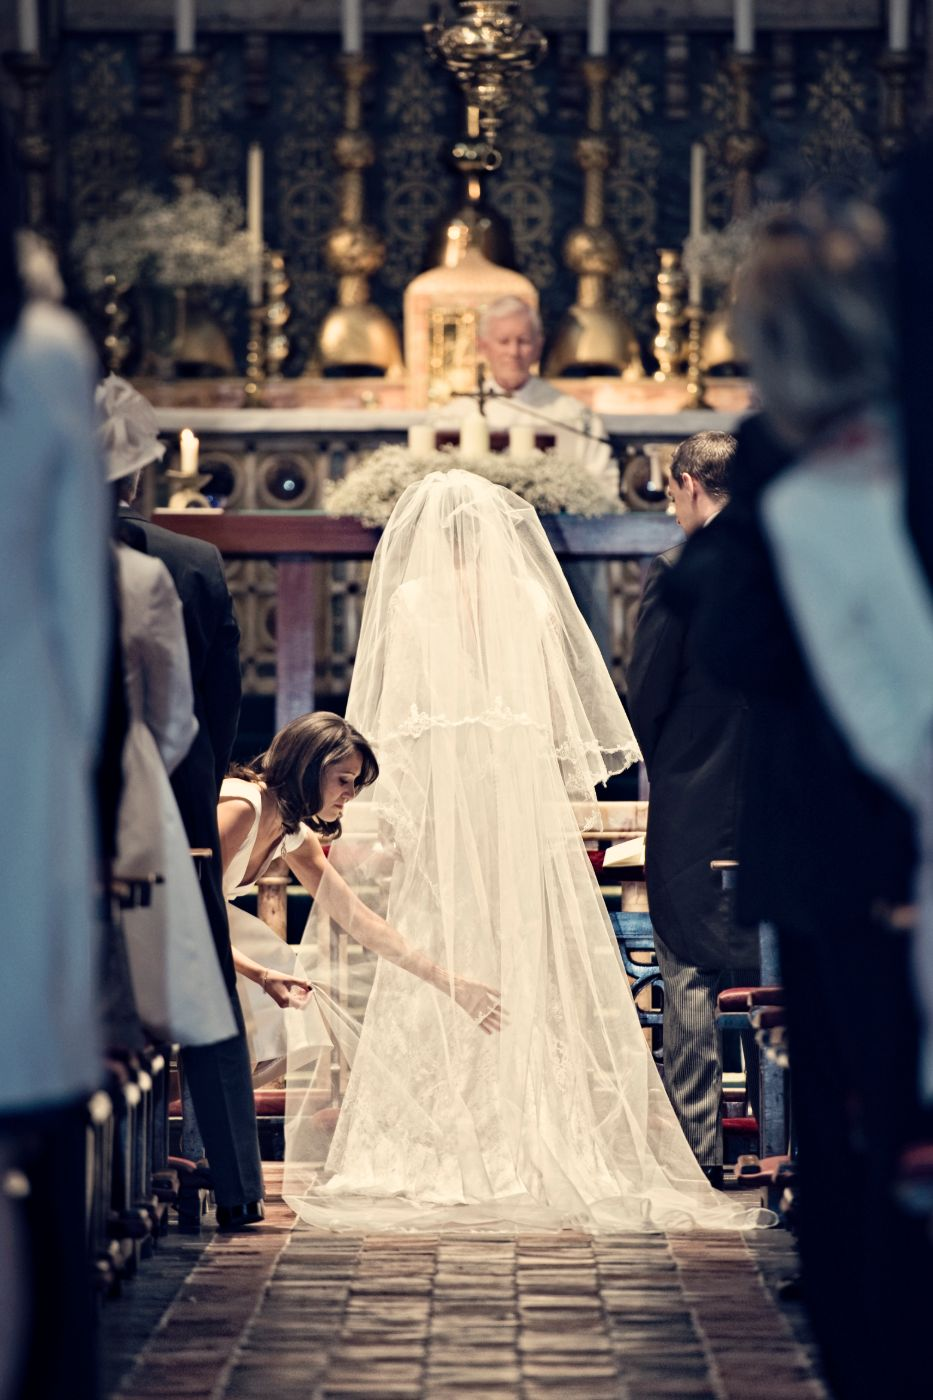 Tara adjusting bride's trailing dress.